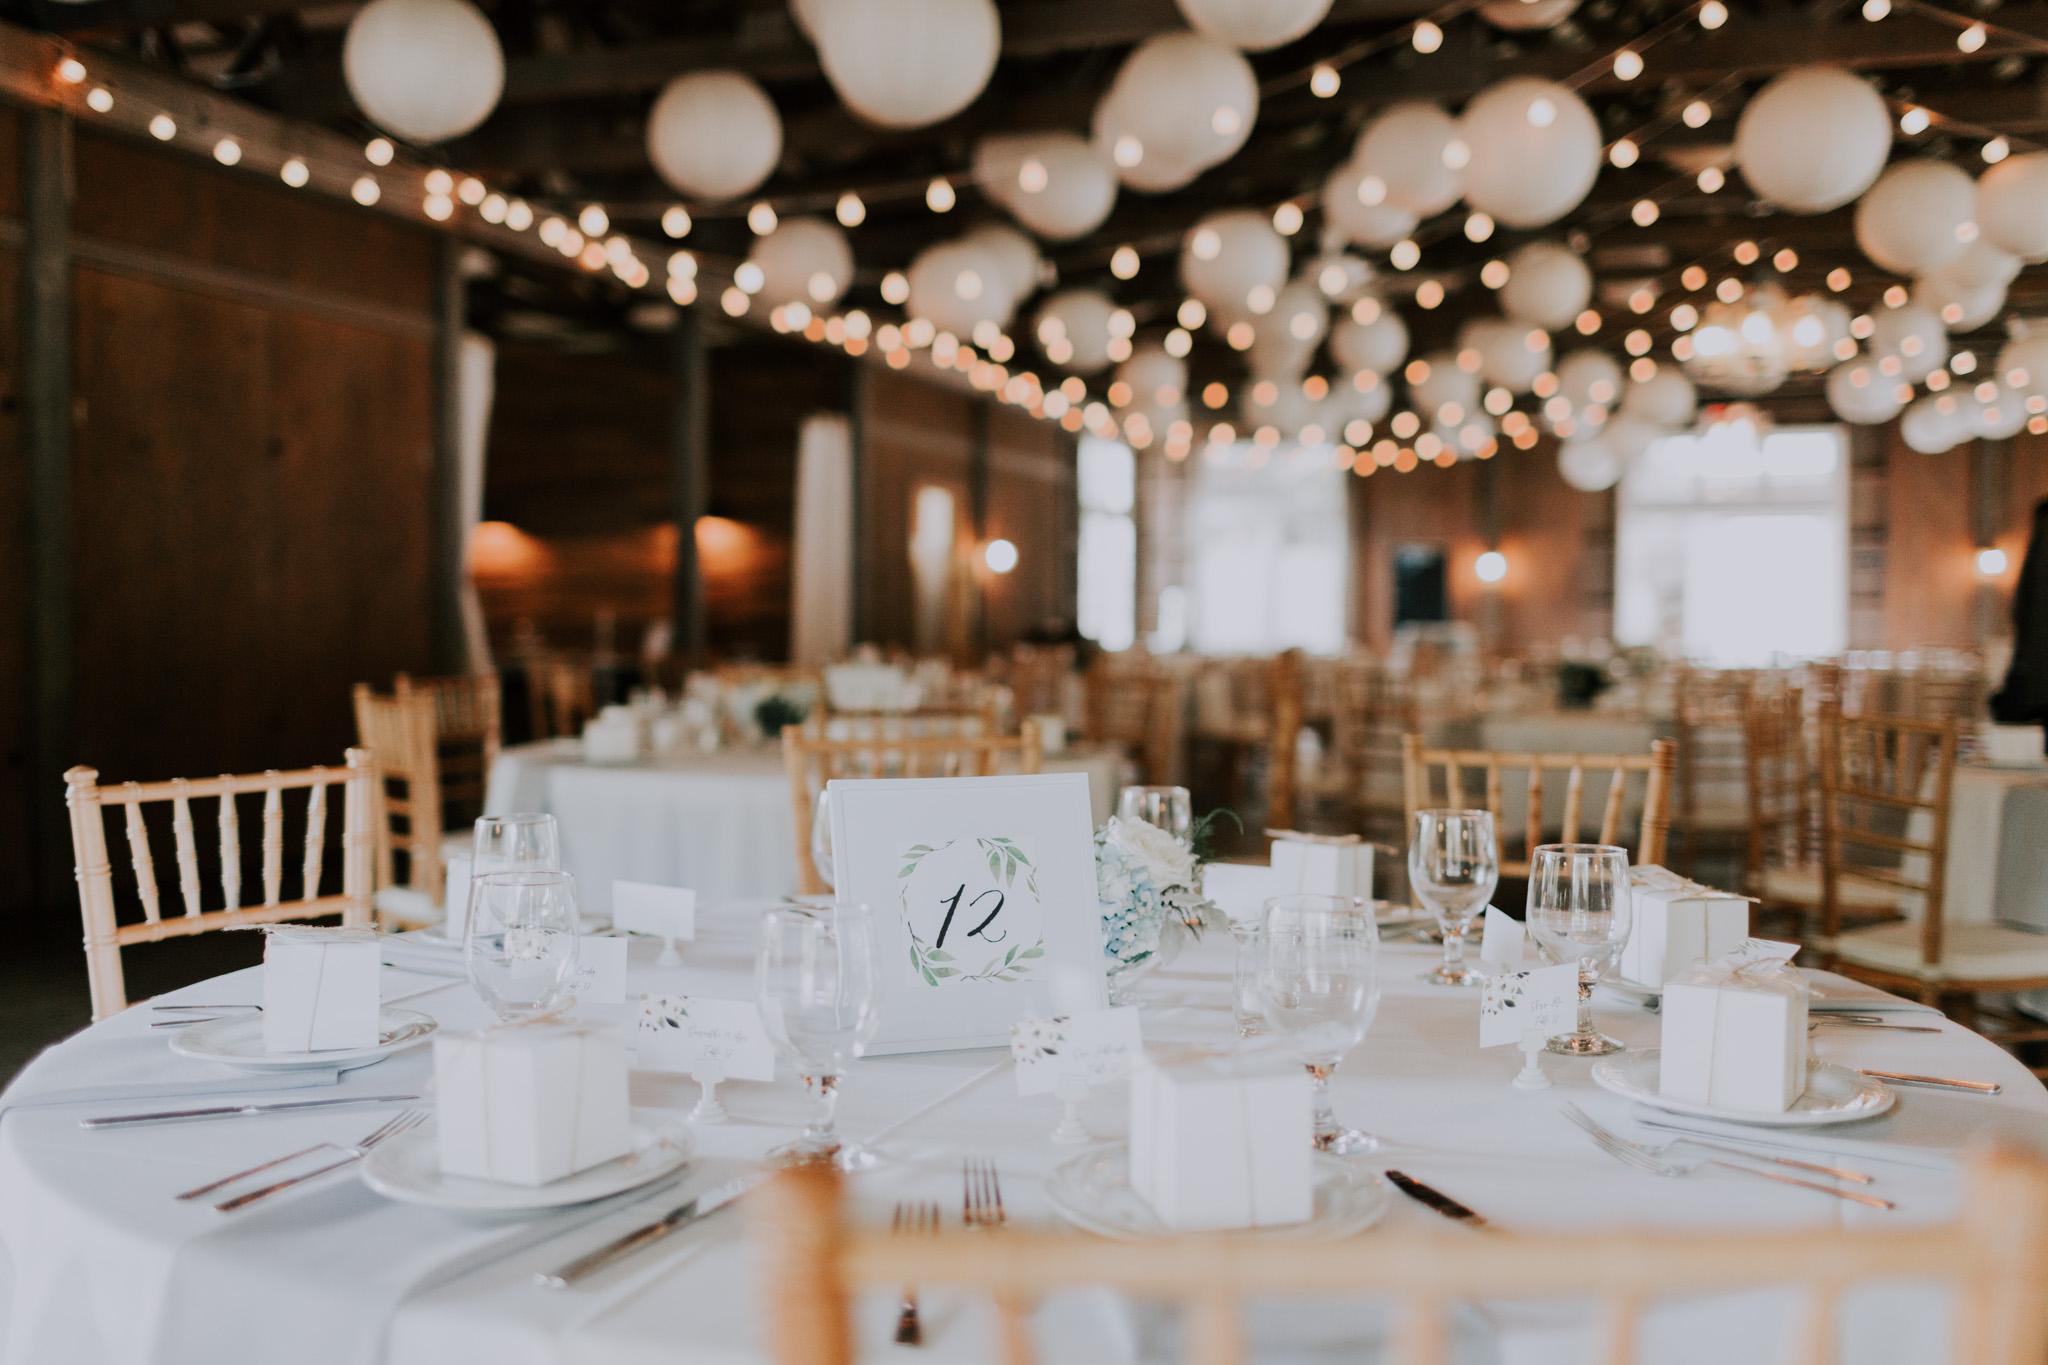 MillCreek-Wilde-Wedding-Barn-Michigan-Eliza-Eric-Vafa-Photo821.jpg